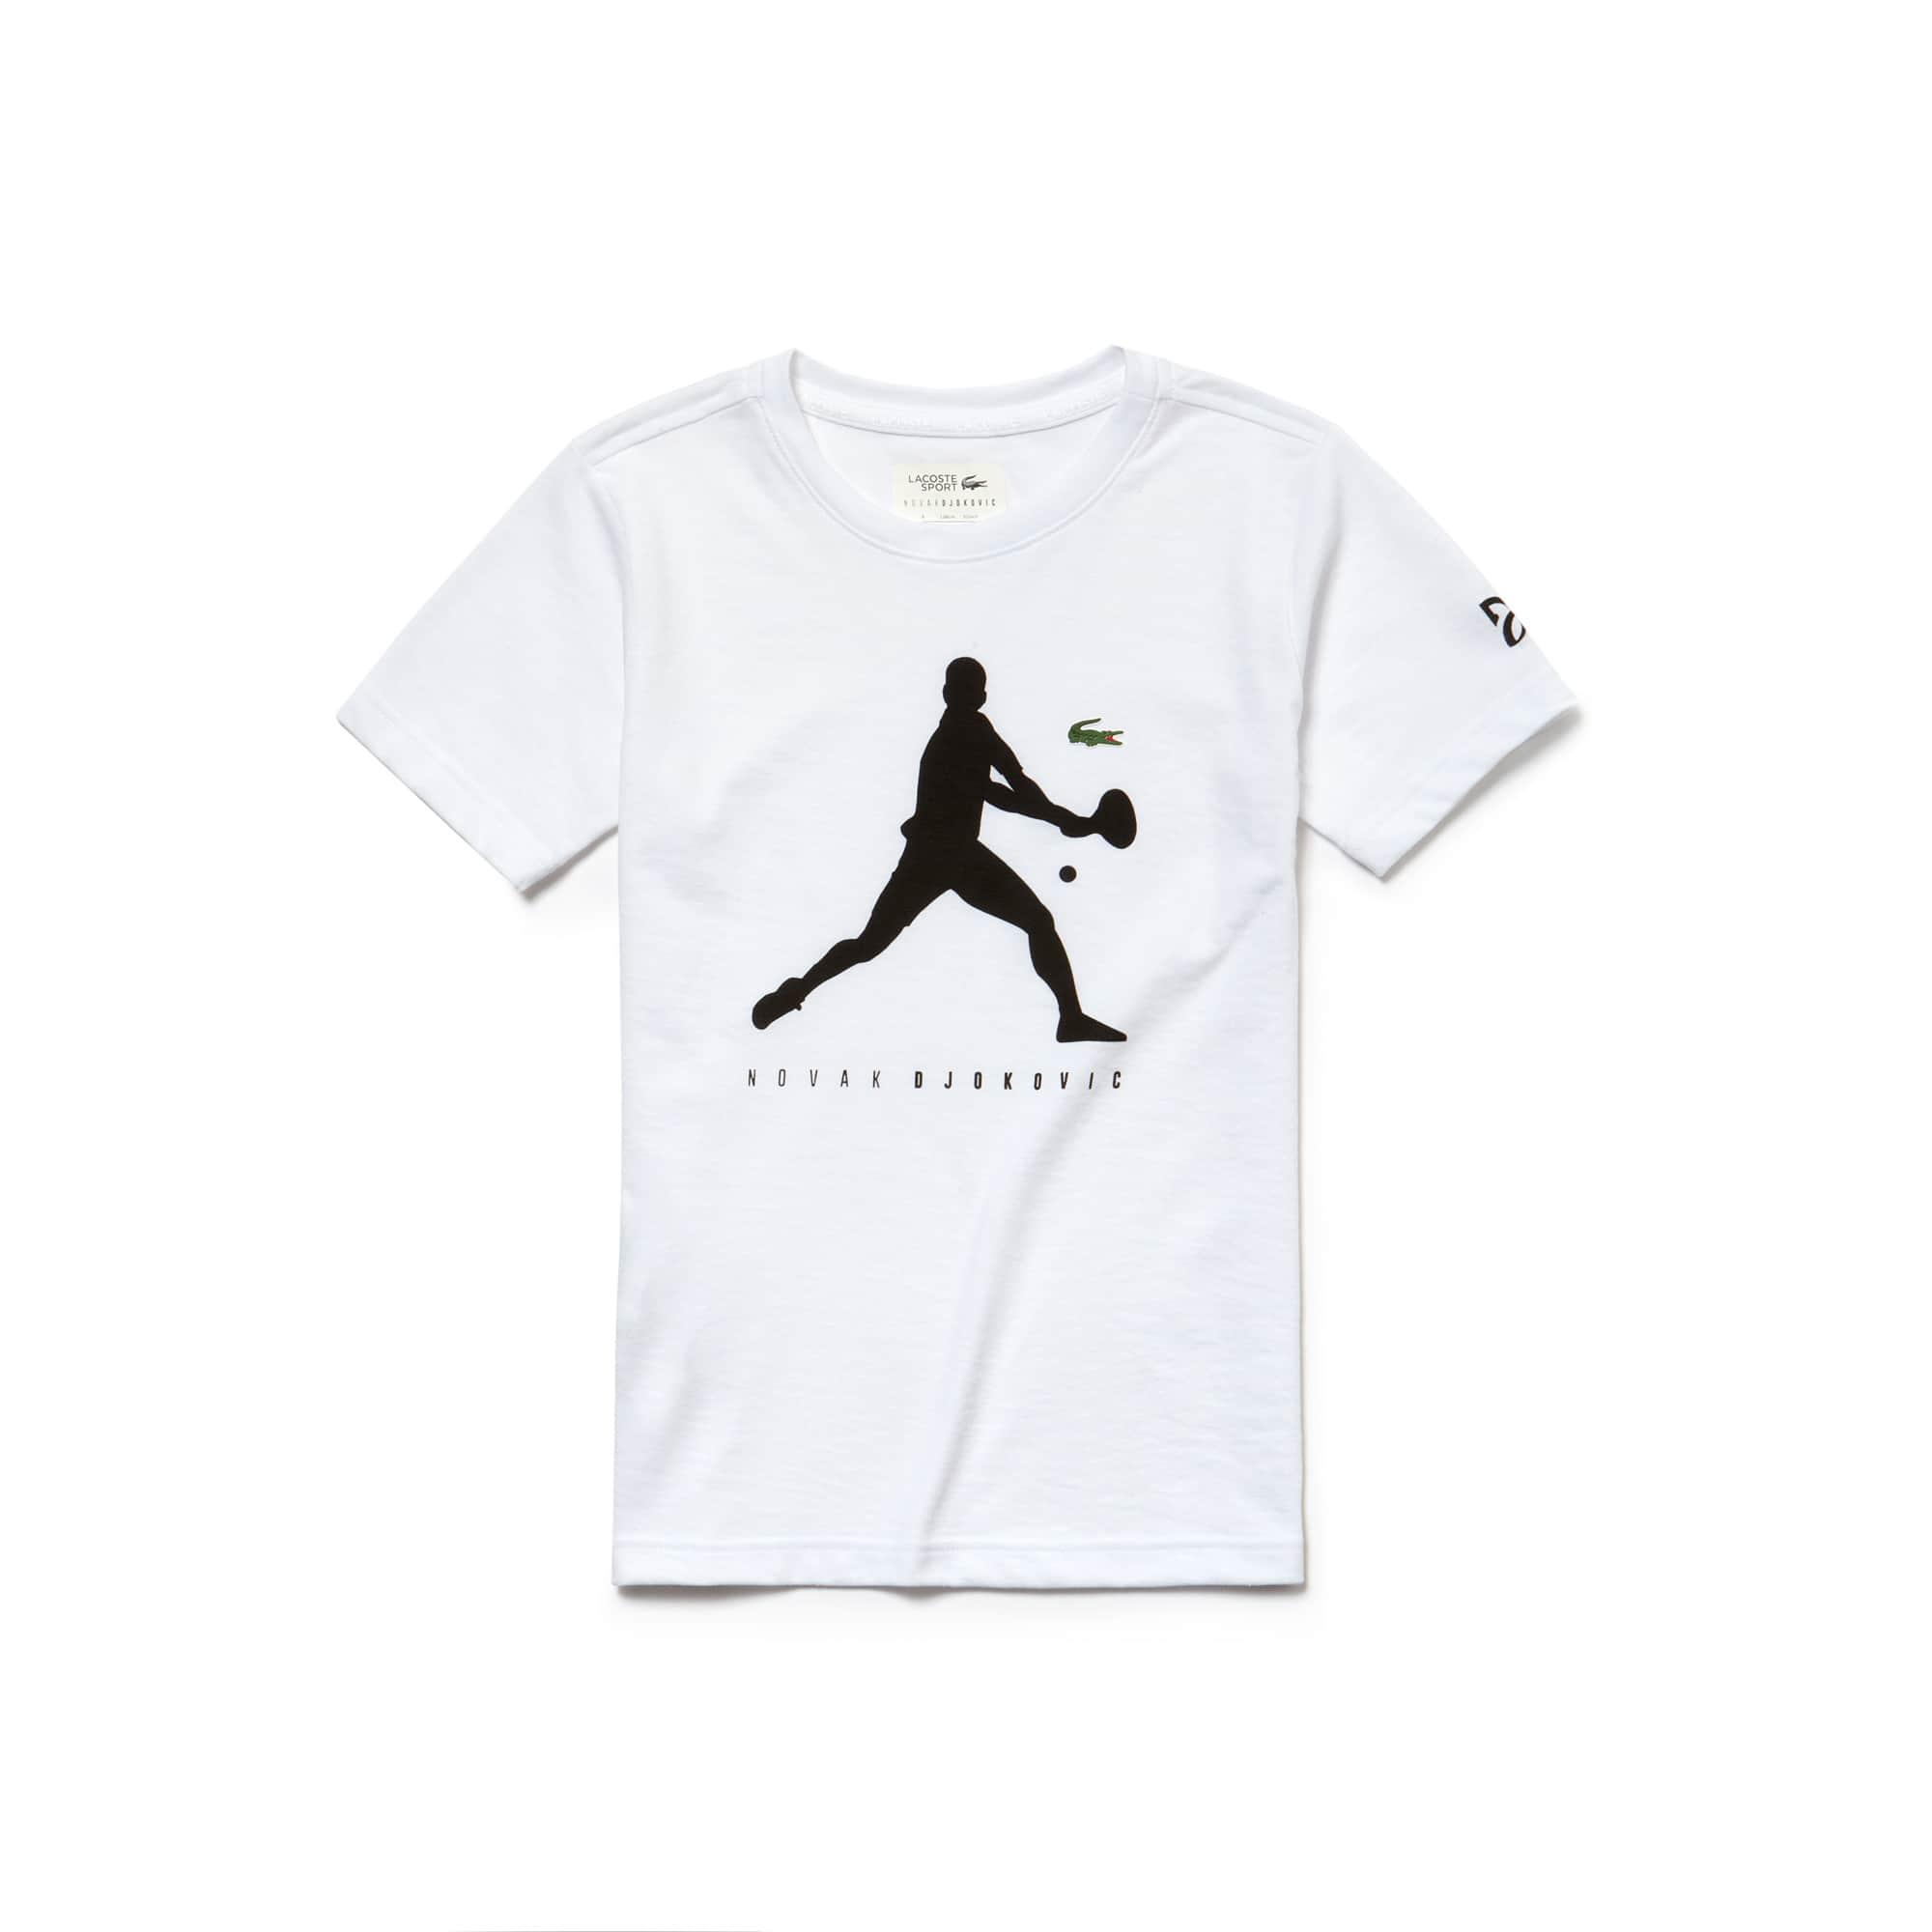 Lacoste SPORT NOVAK DJOKOVIC SUPPORT WITH STYLE COLLECTION-T-shirt jongens technische jersey